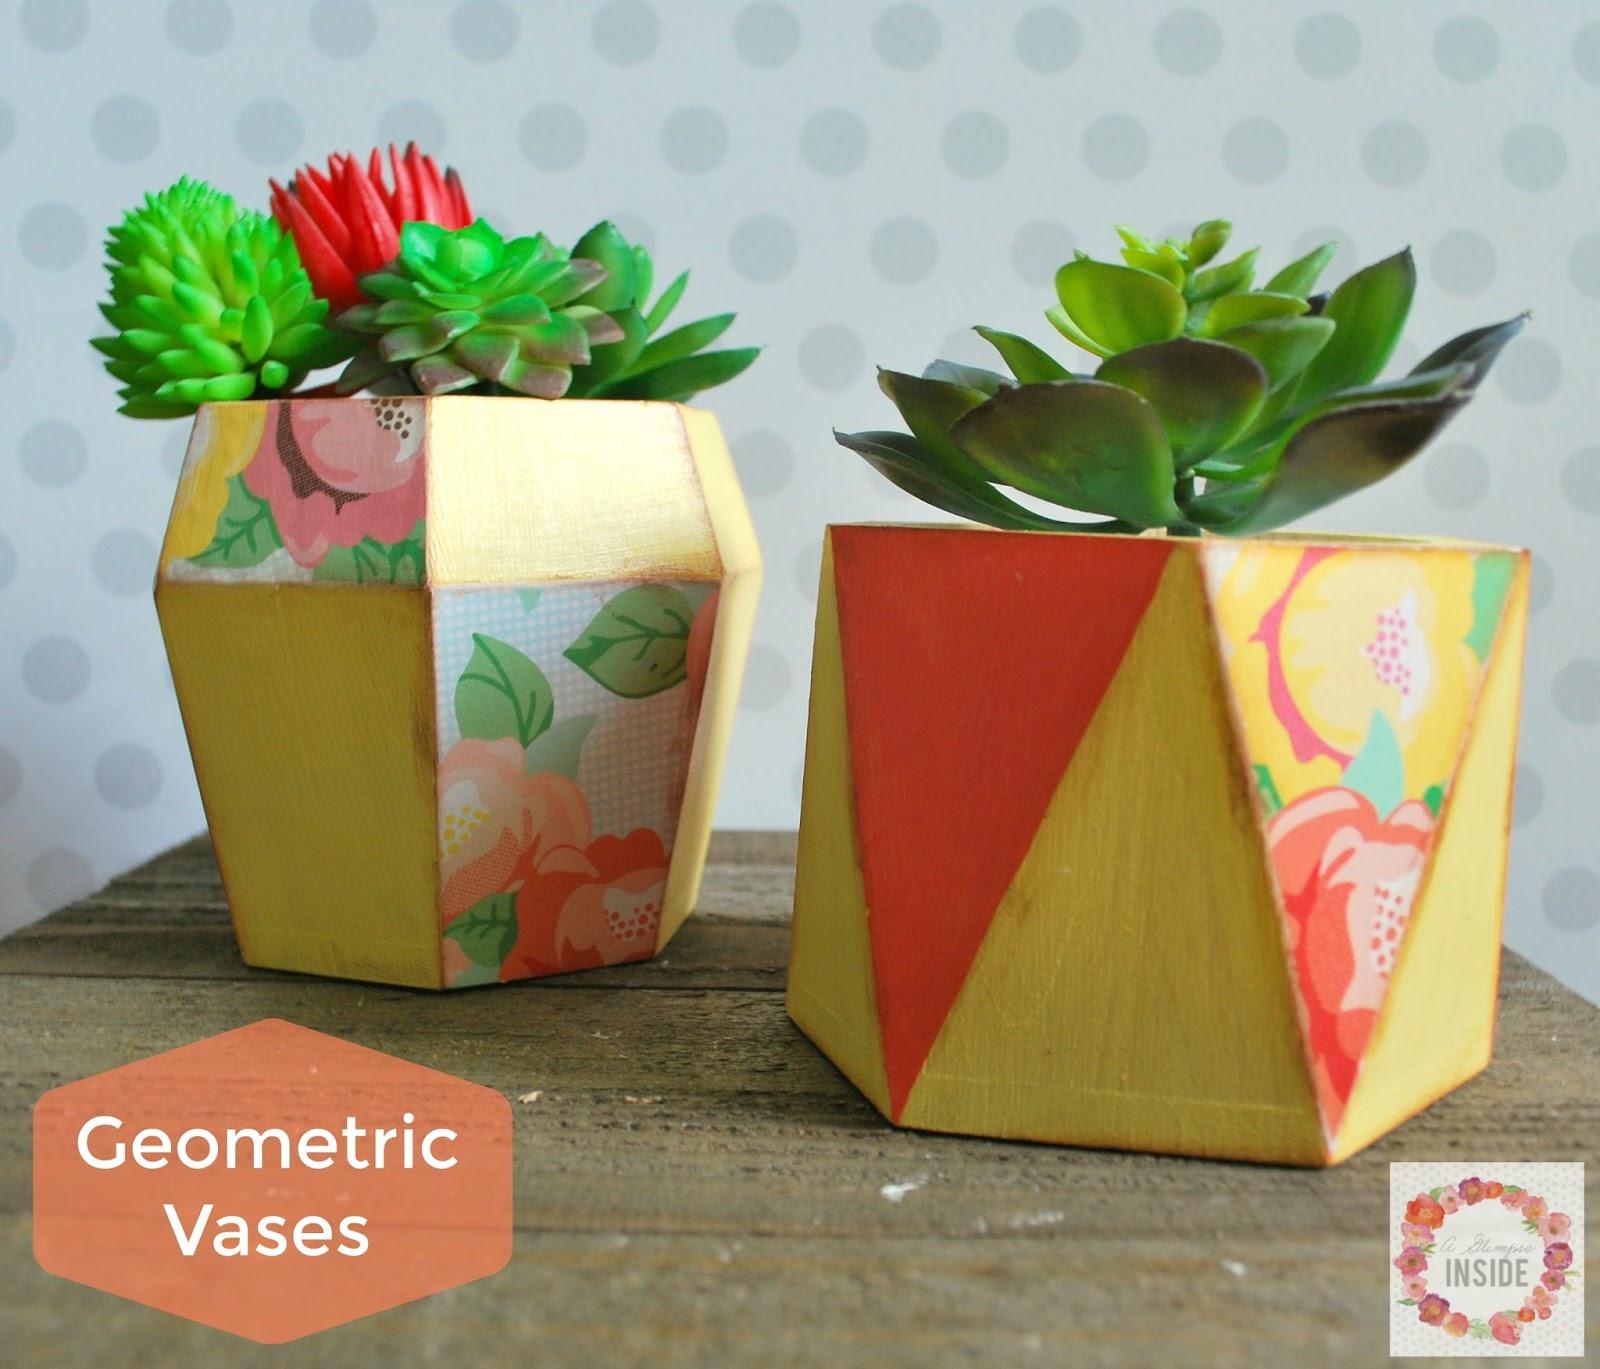 http://www.aglimpseinsideblog.com/2016/07/geometric-vases.html